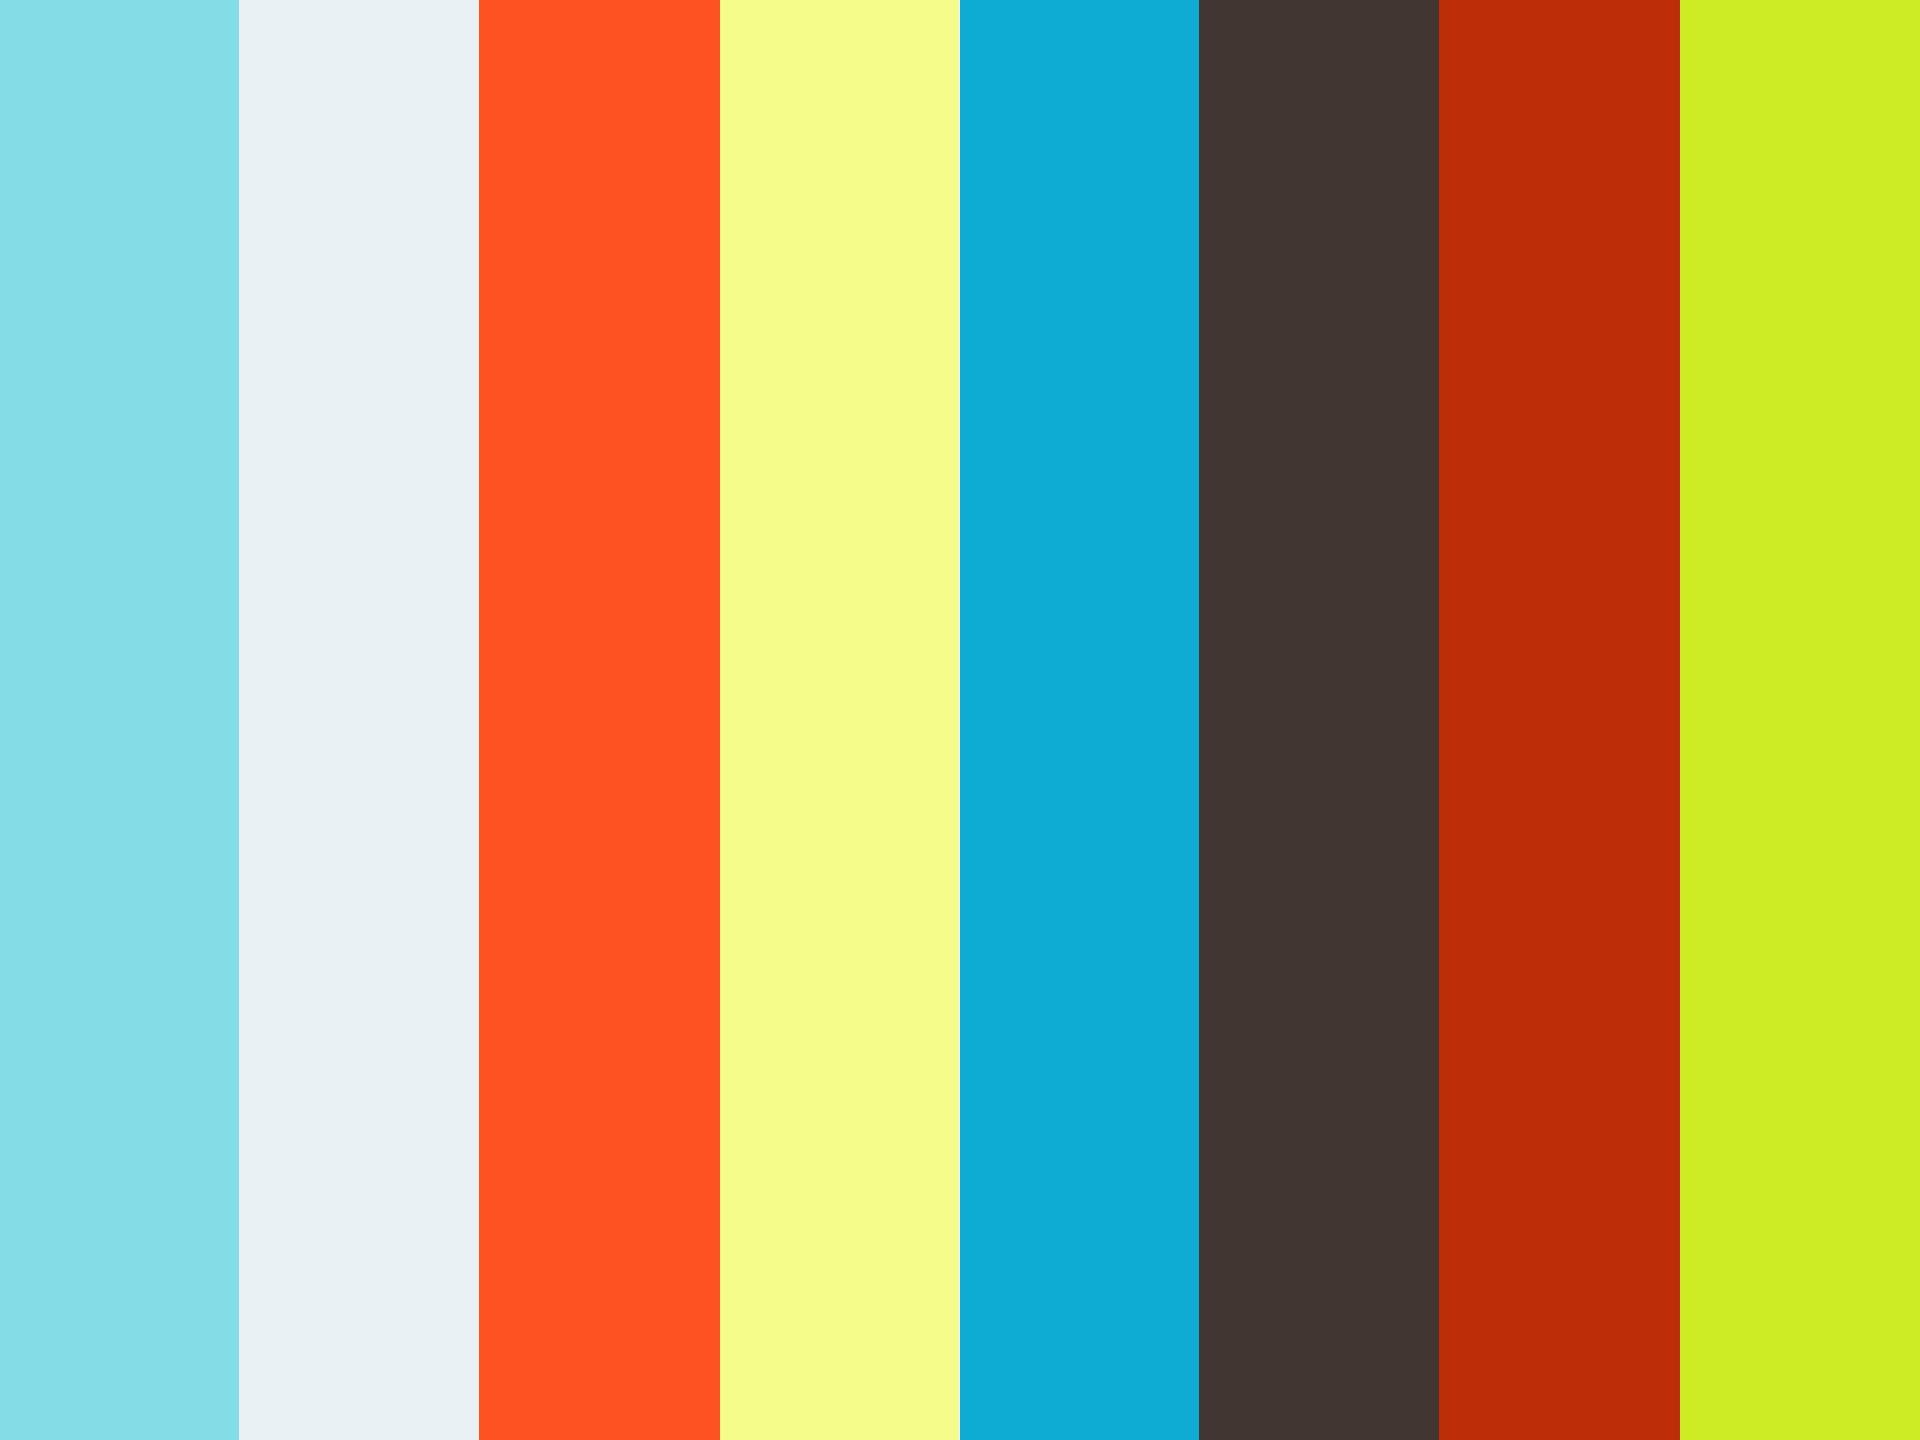 Tr Iler Los Peque Os Muebles Dir Lena Dunham On Vimeo # Muebles Pequenos